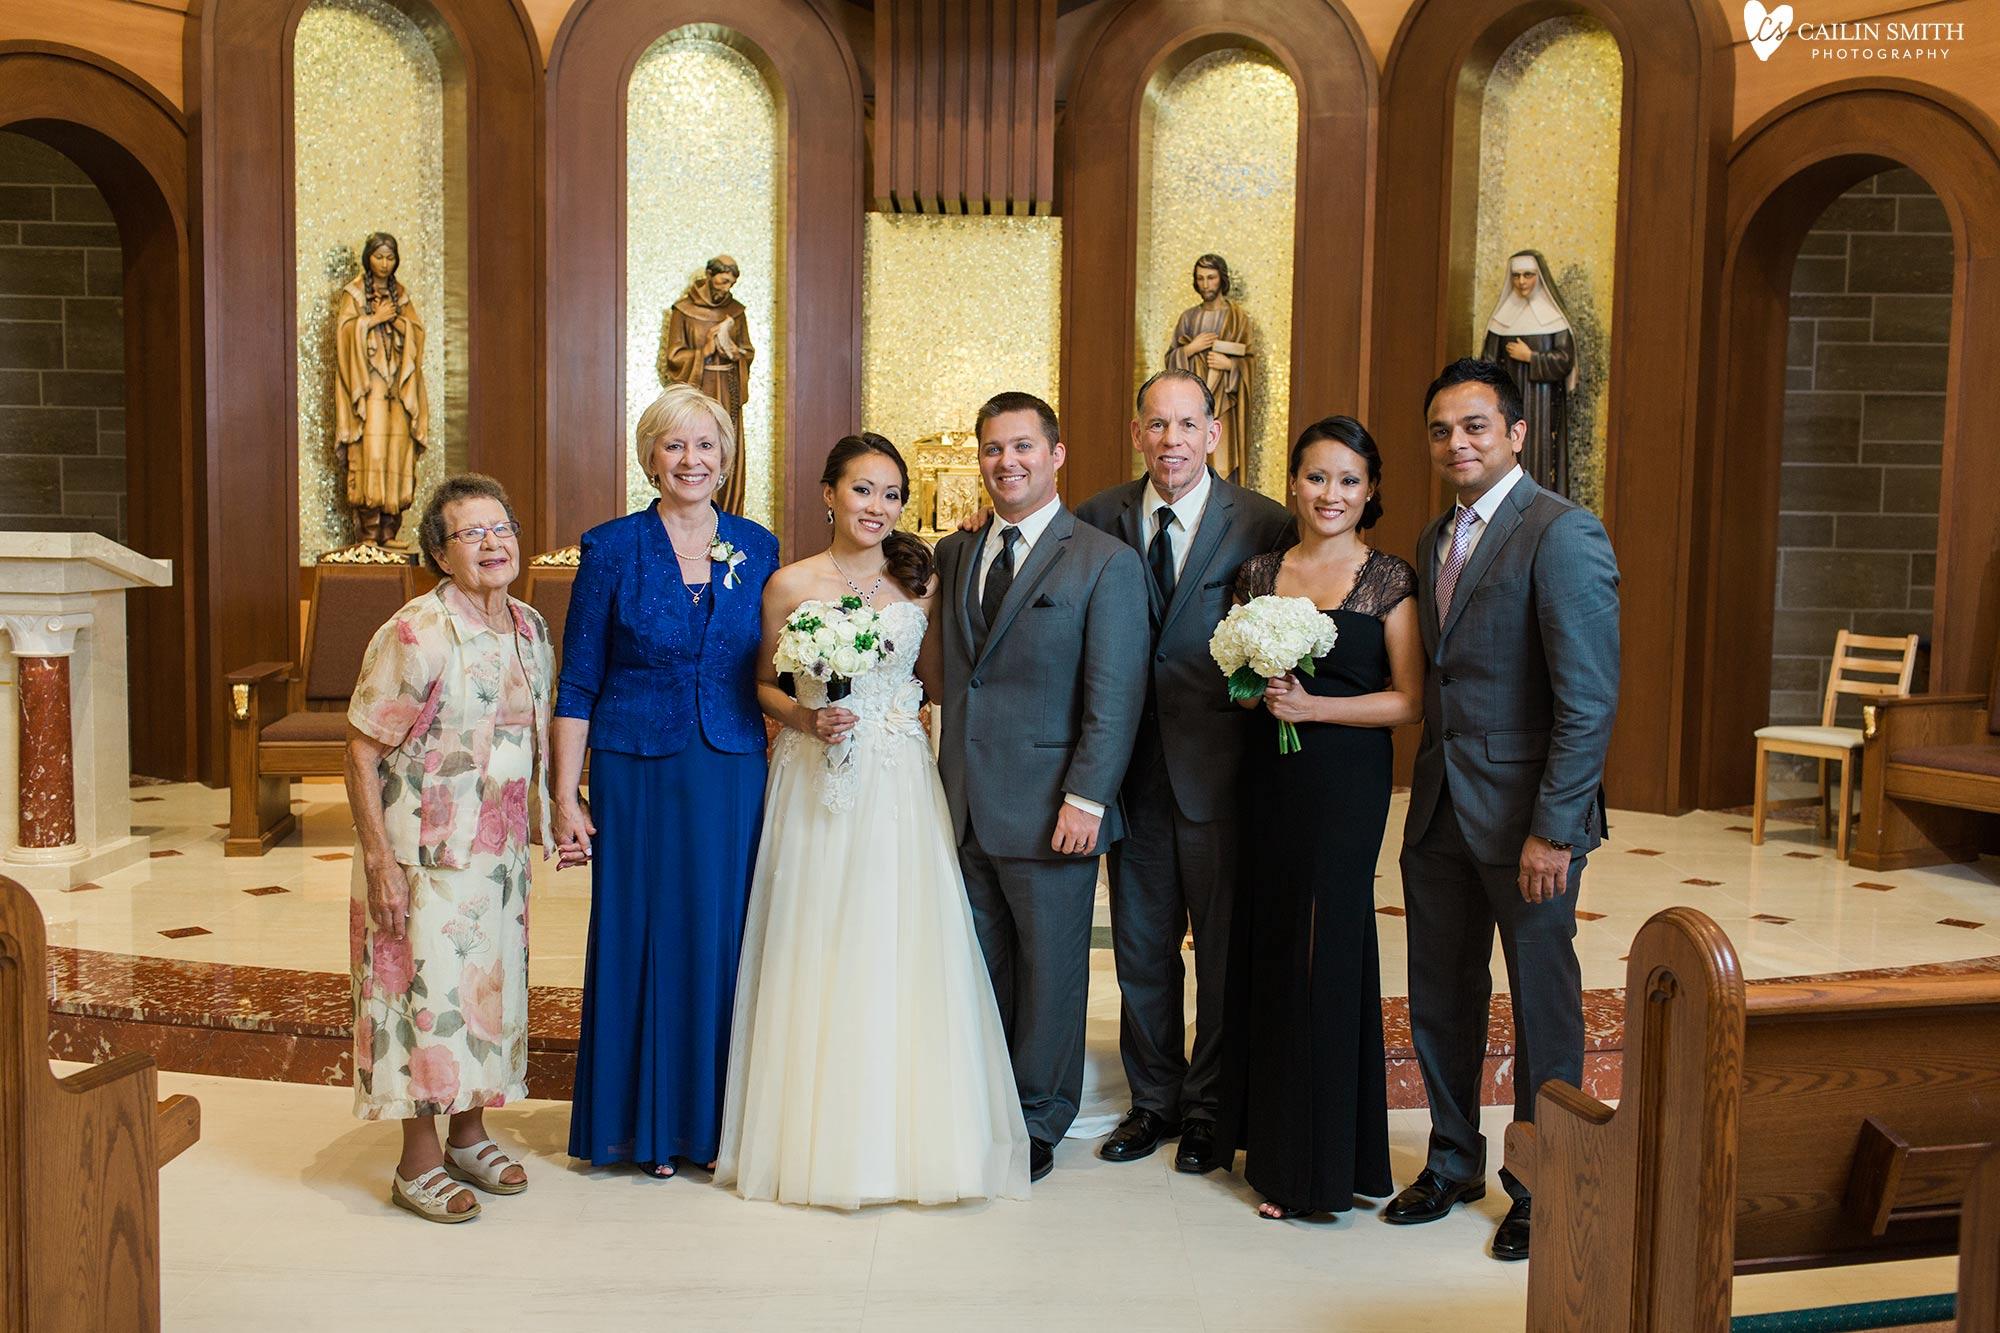 Jenifer_Dewey_Treasury_on_The_Plaza_Wedding_Photography_031.jpg